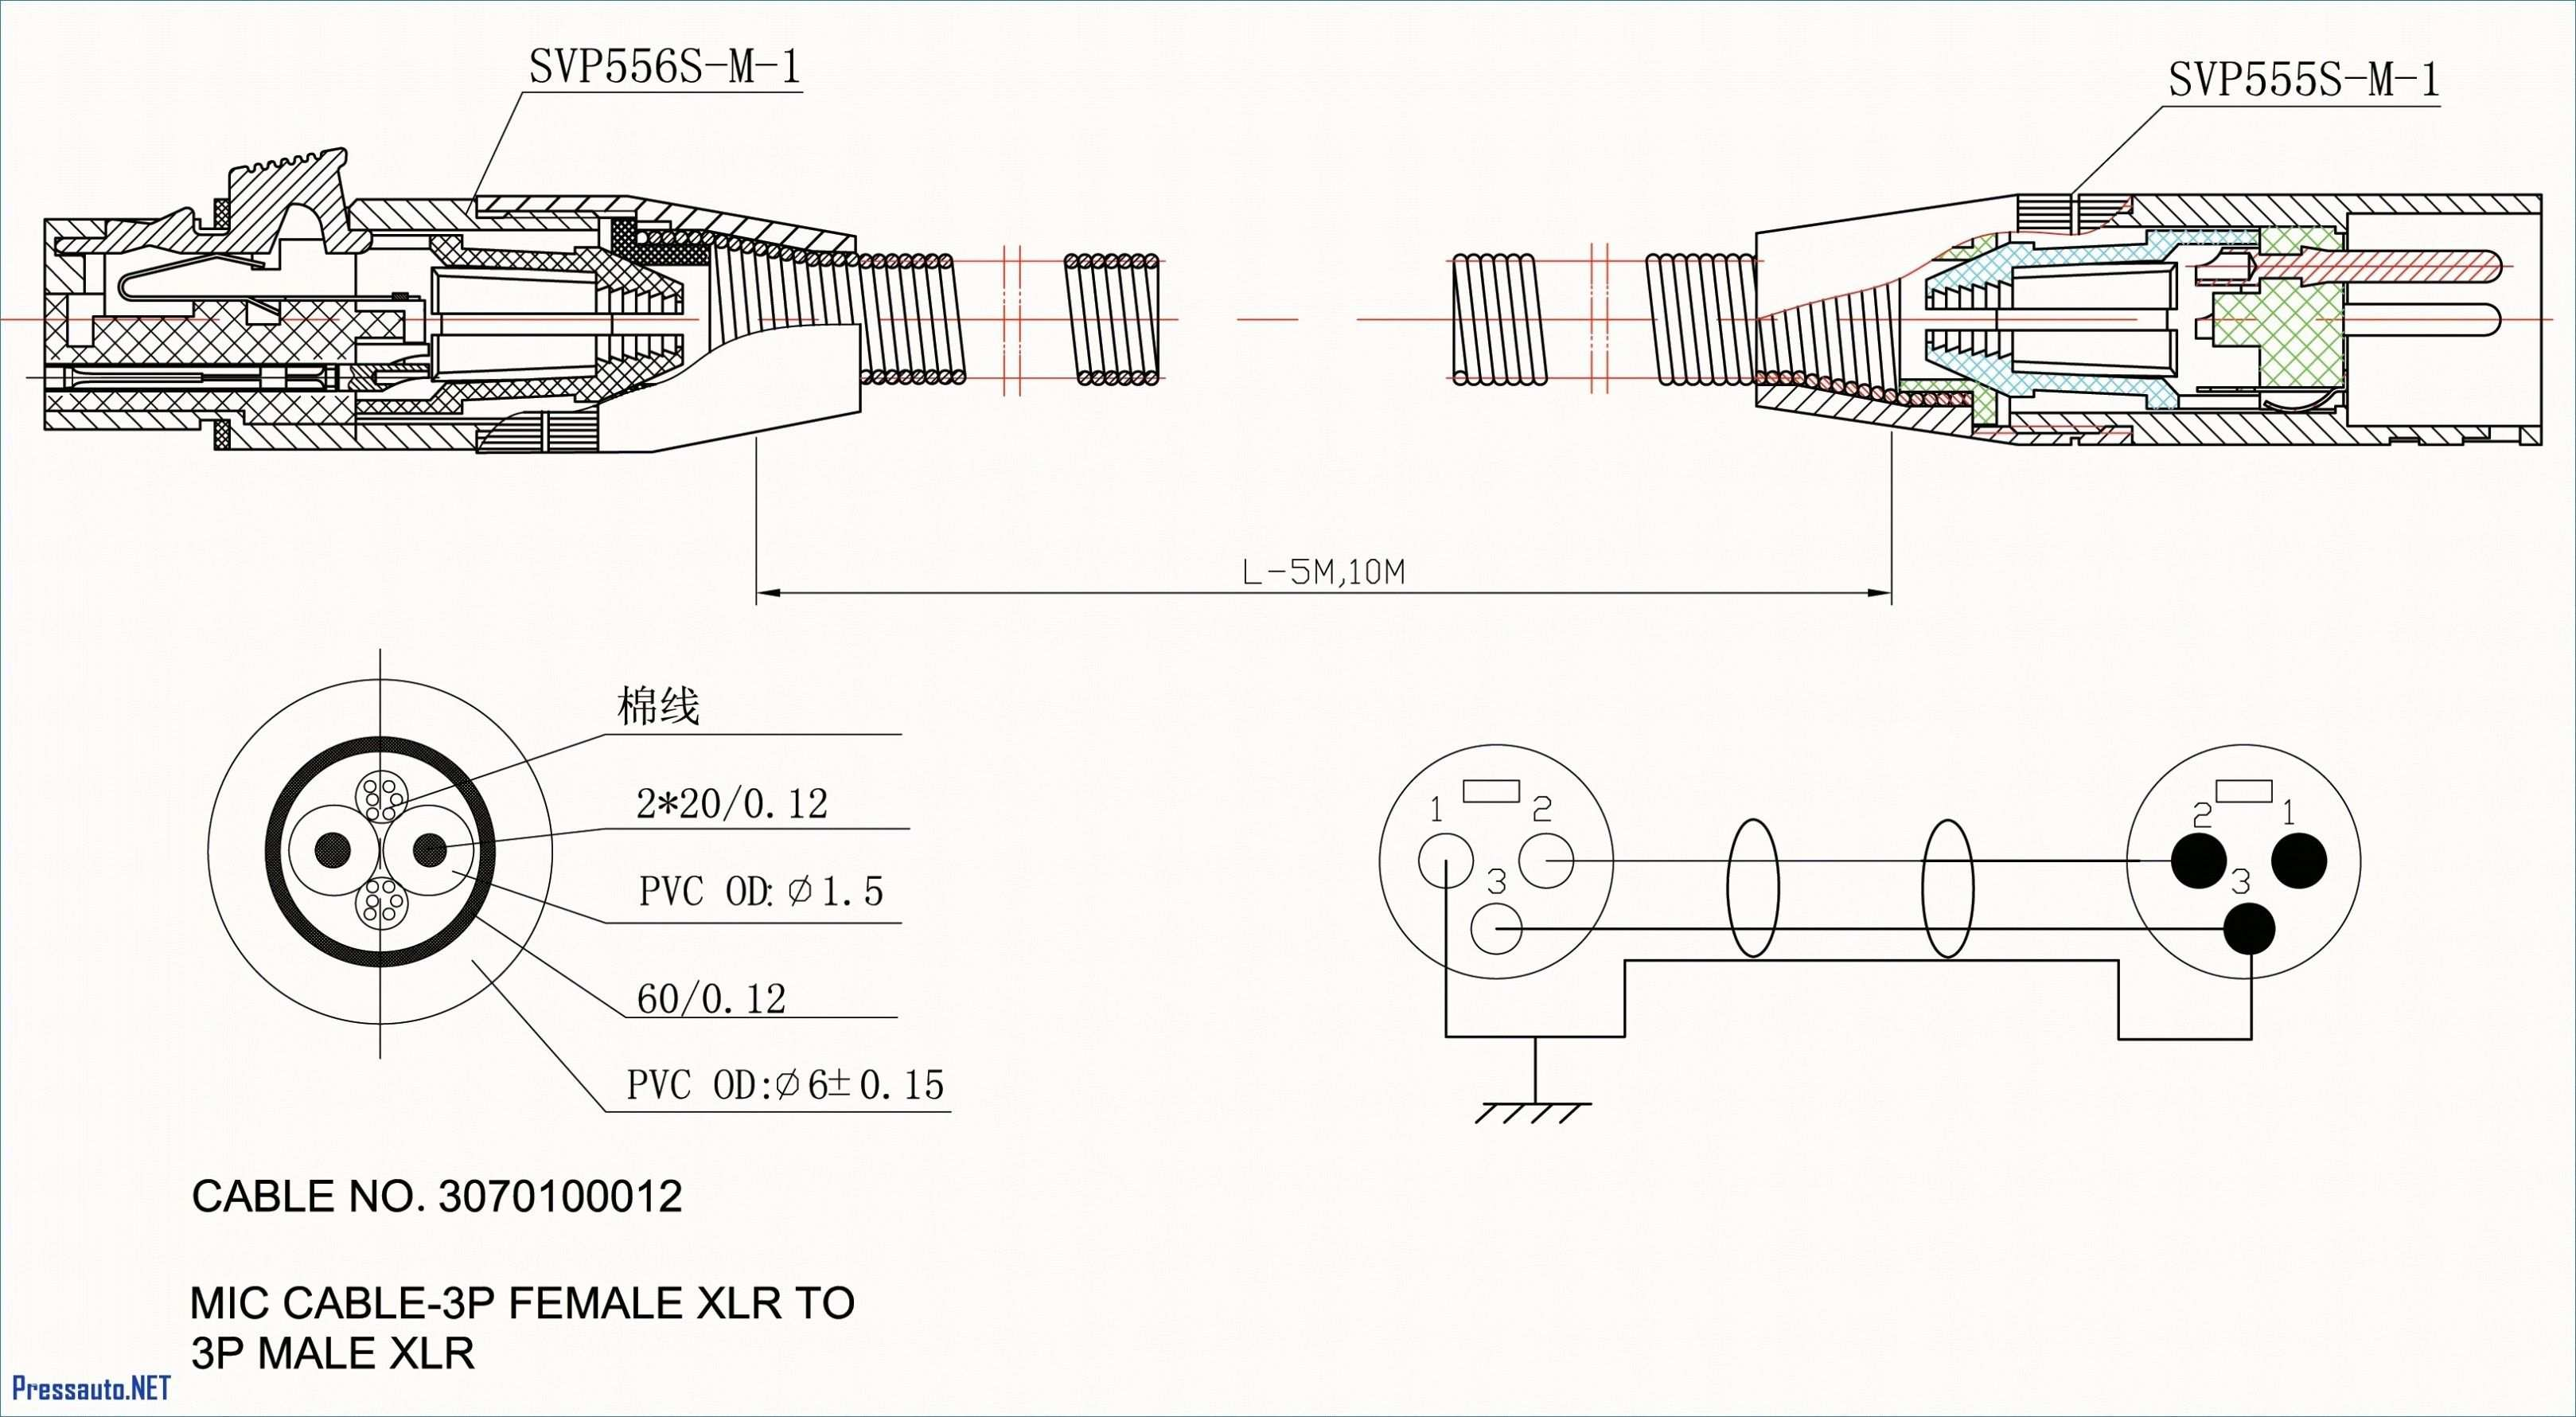 Winnebago Motorhome Wiring Diagram For Your Needs